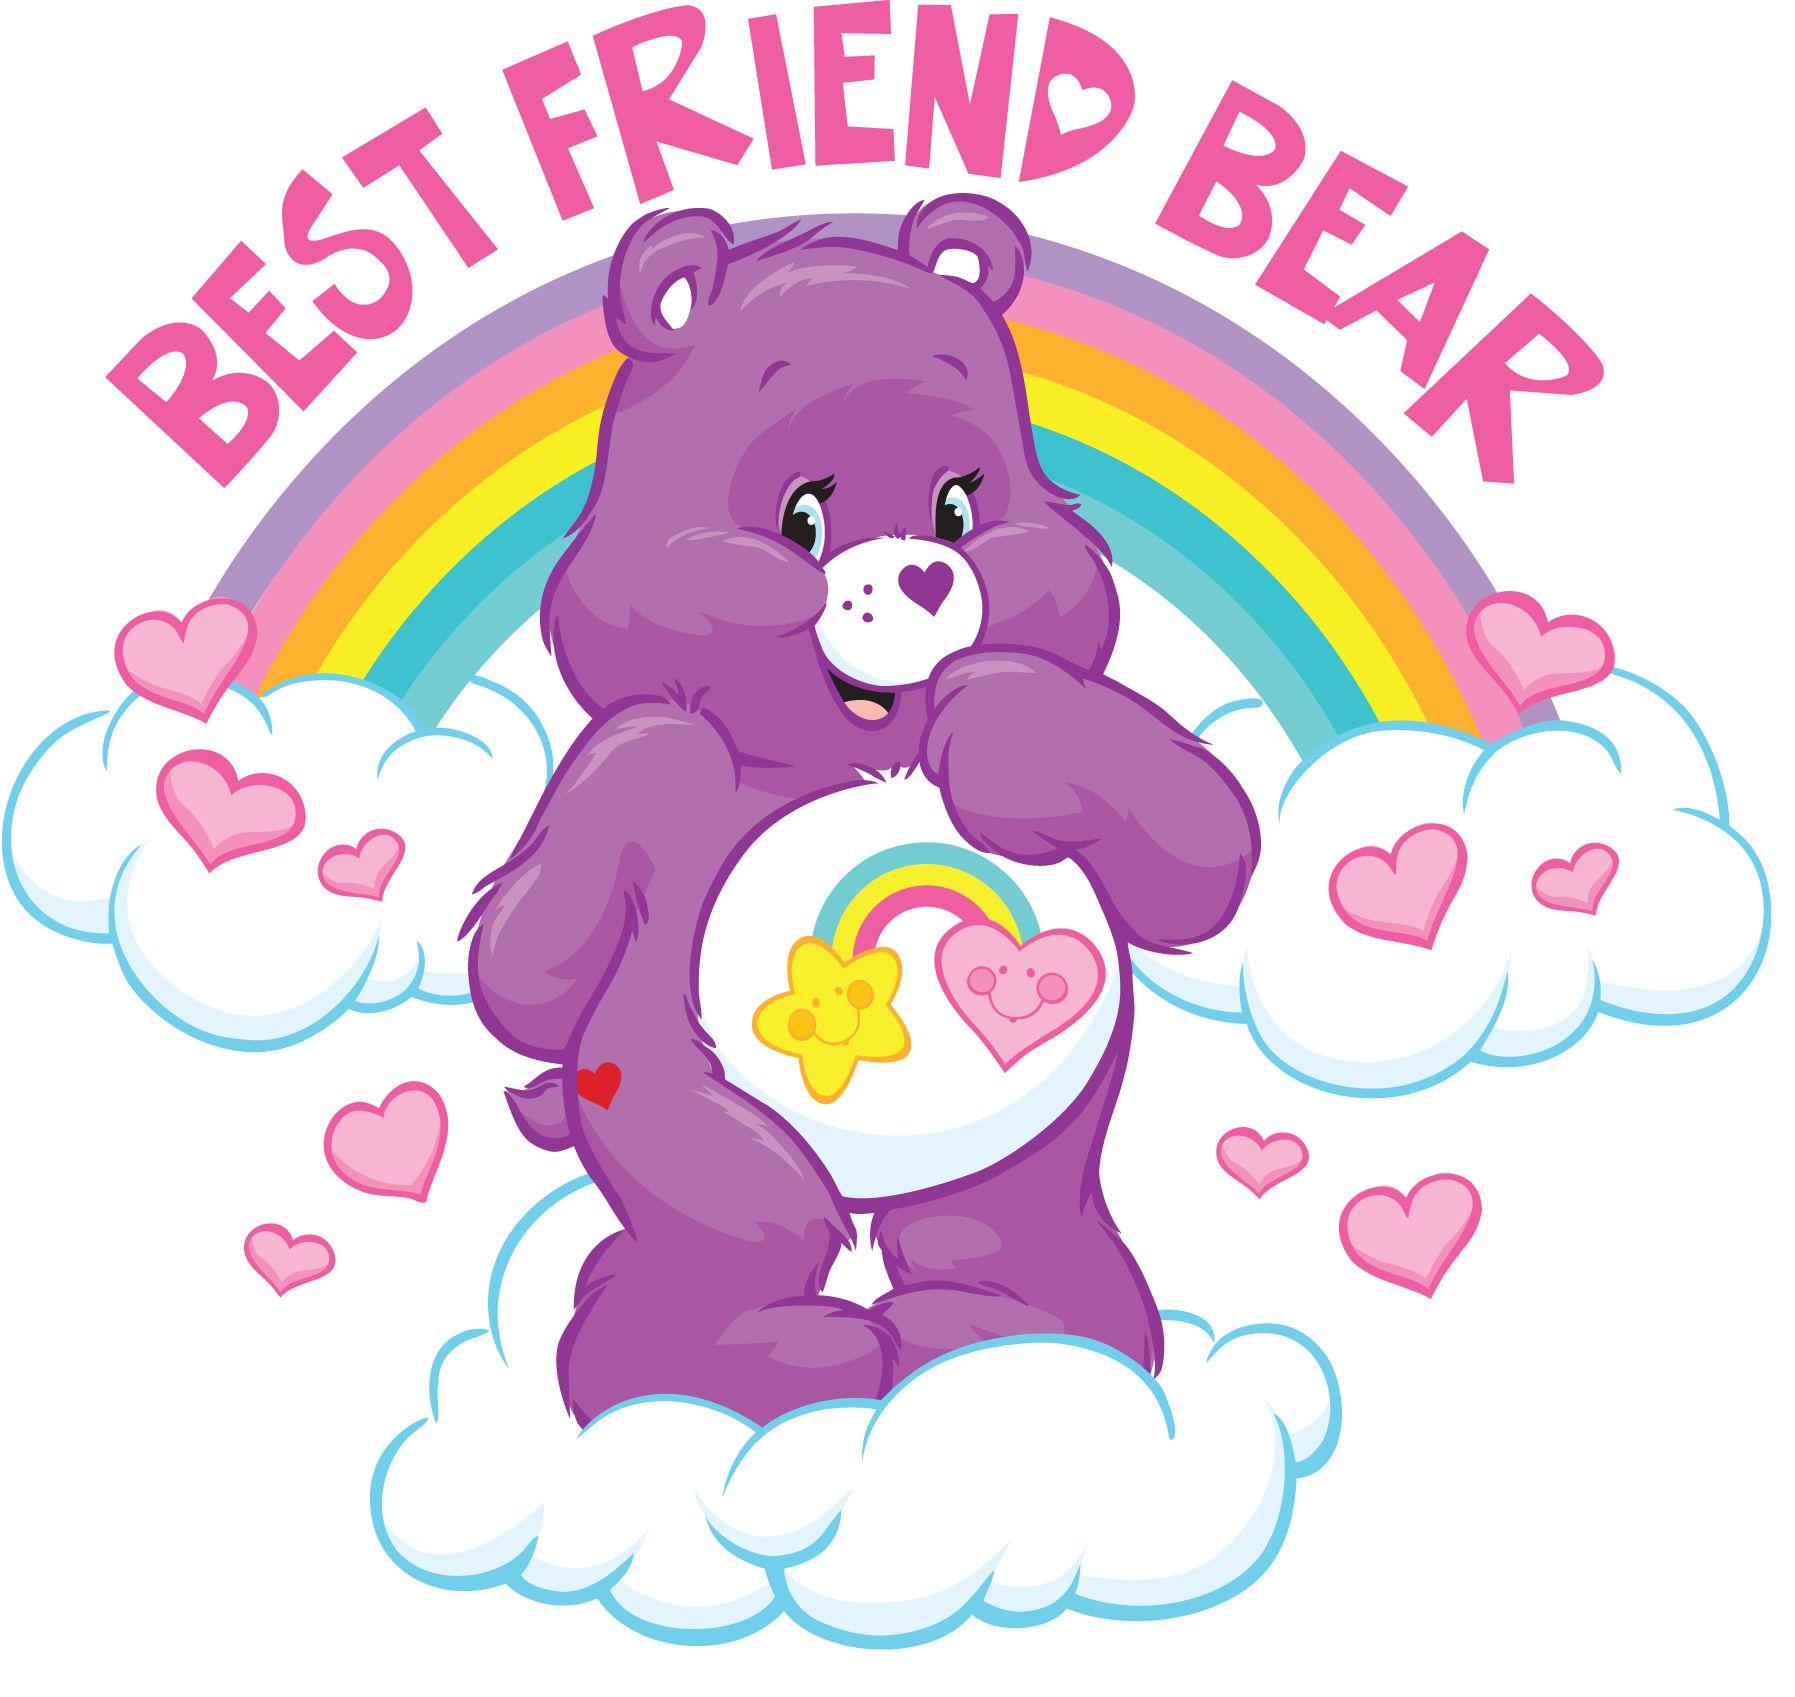 Care Bears Wallpaper: Meet The Care Bears